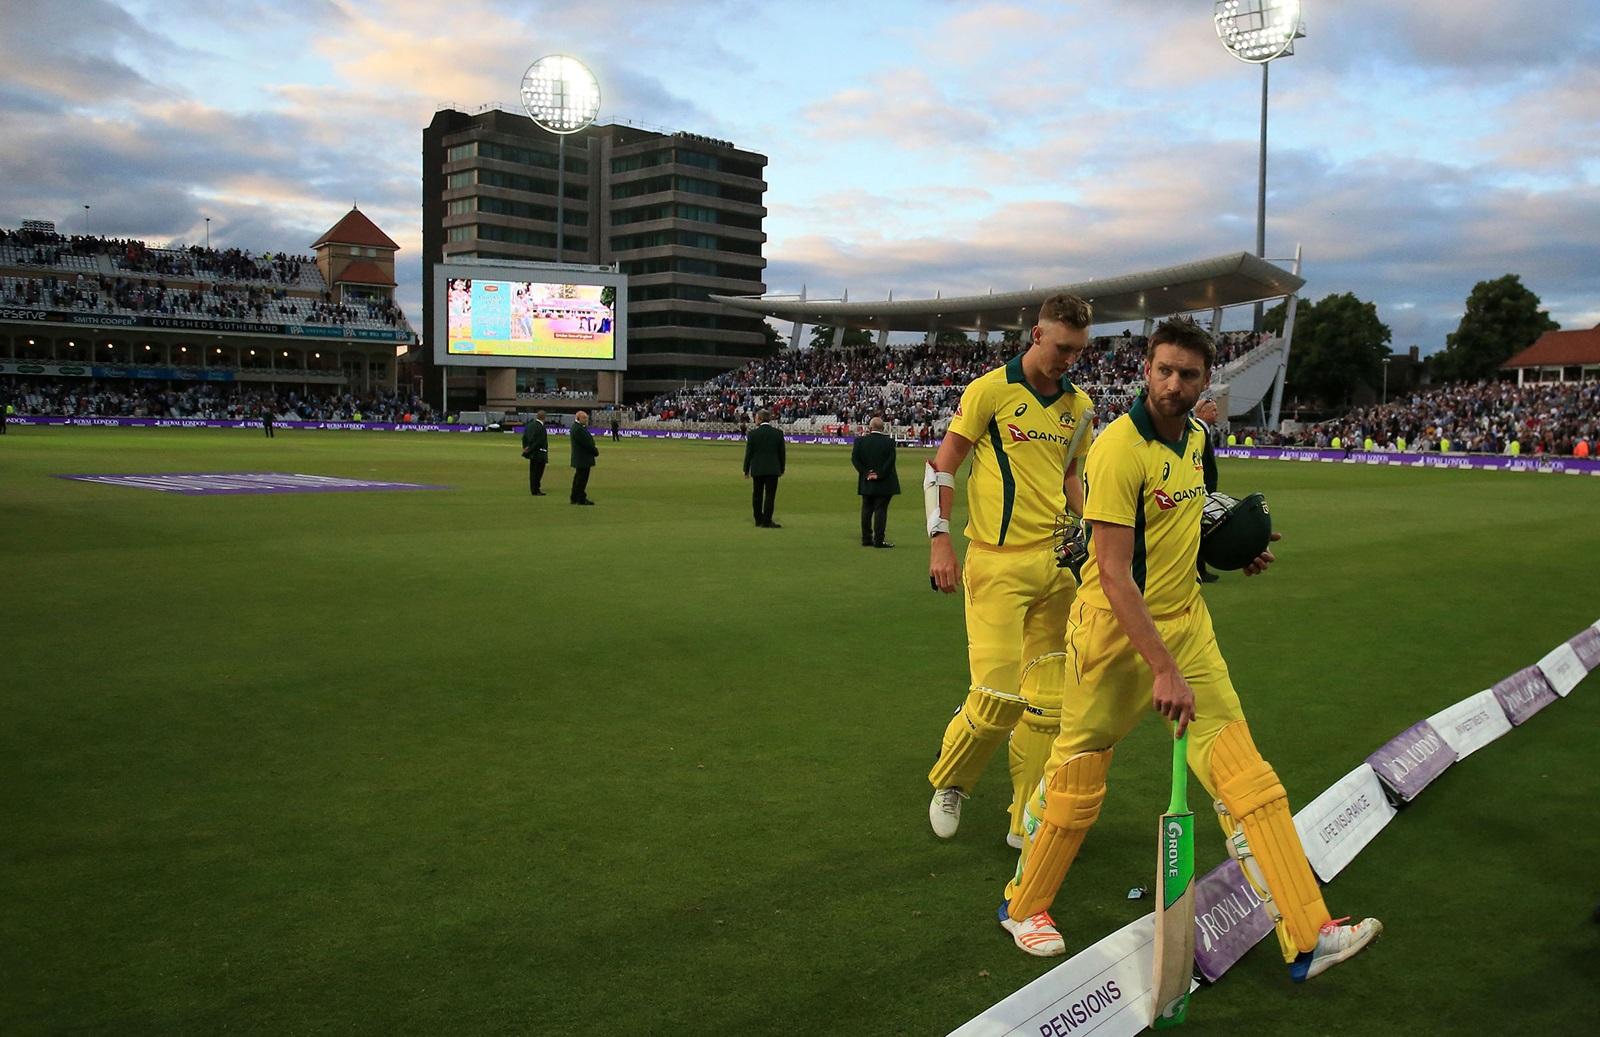 271abe3462efb Curse could haunt Aussies at World Cup | cricket.com.au